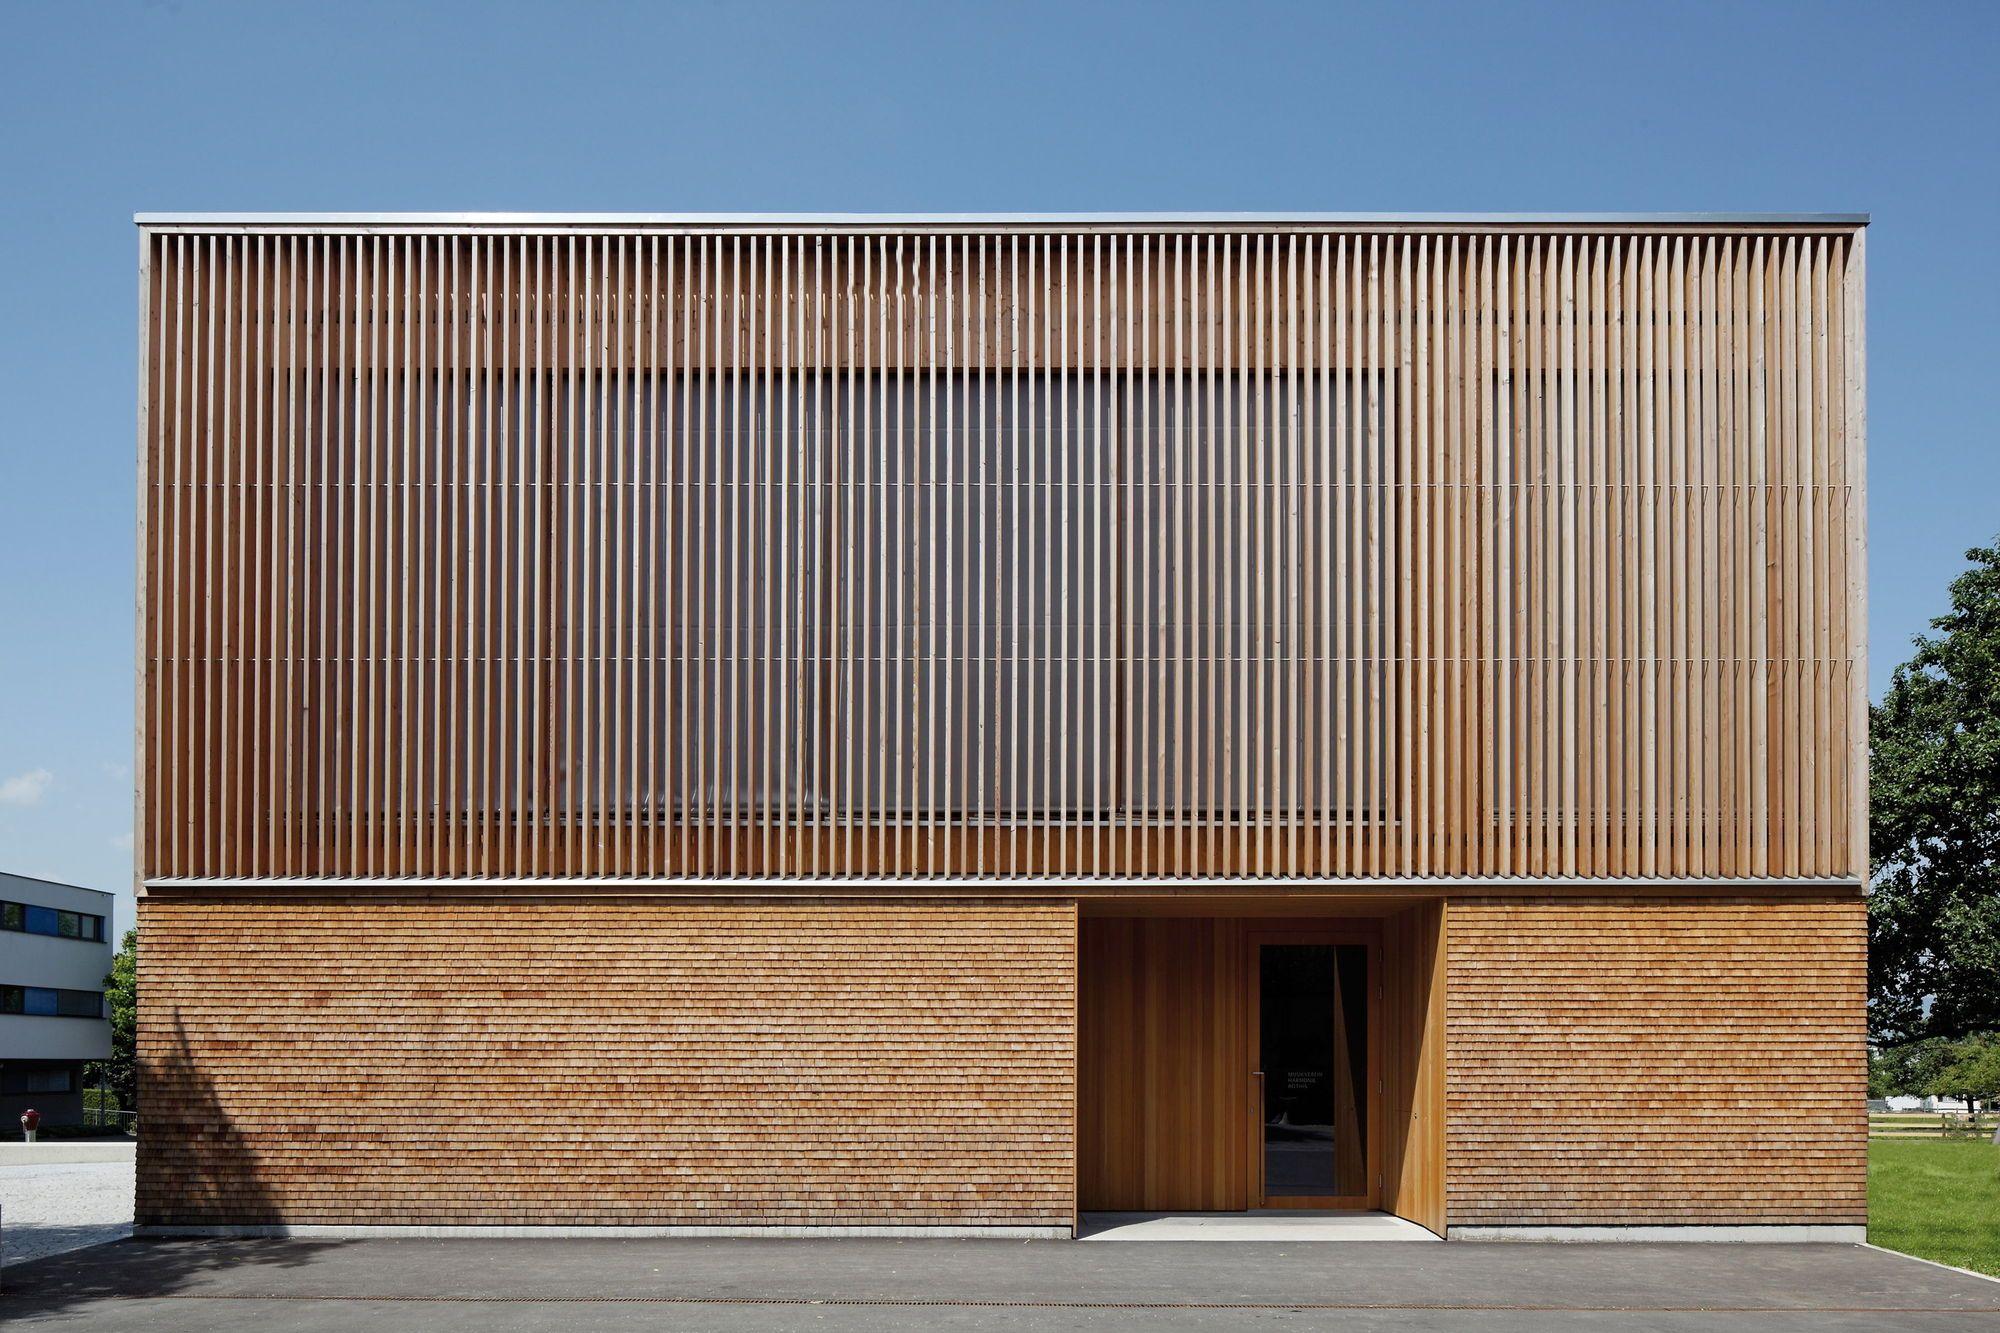 Musikhaus, Röthis | Vorarlberger Holzbaukunst #arquitectonico